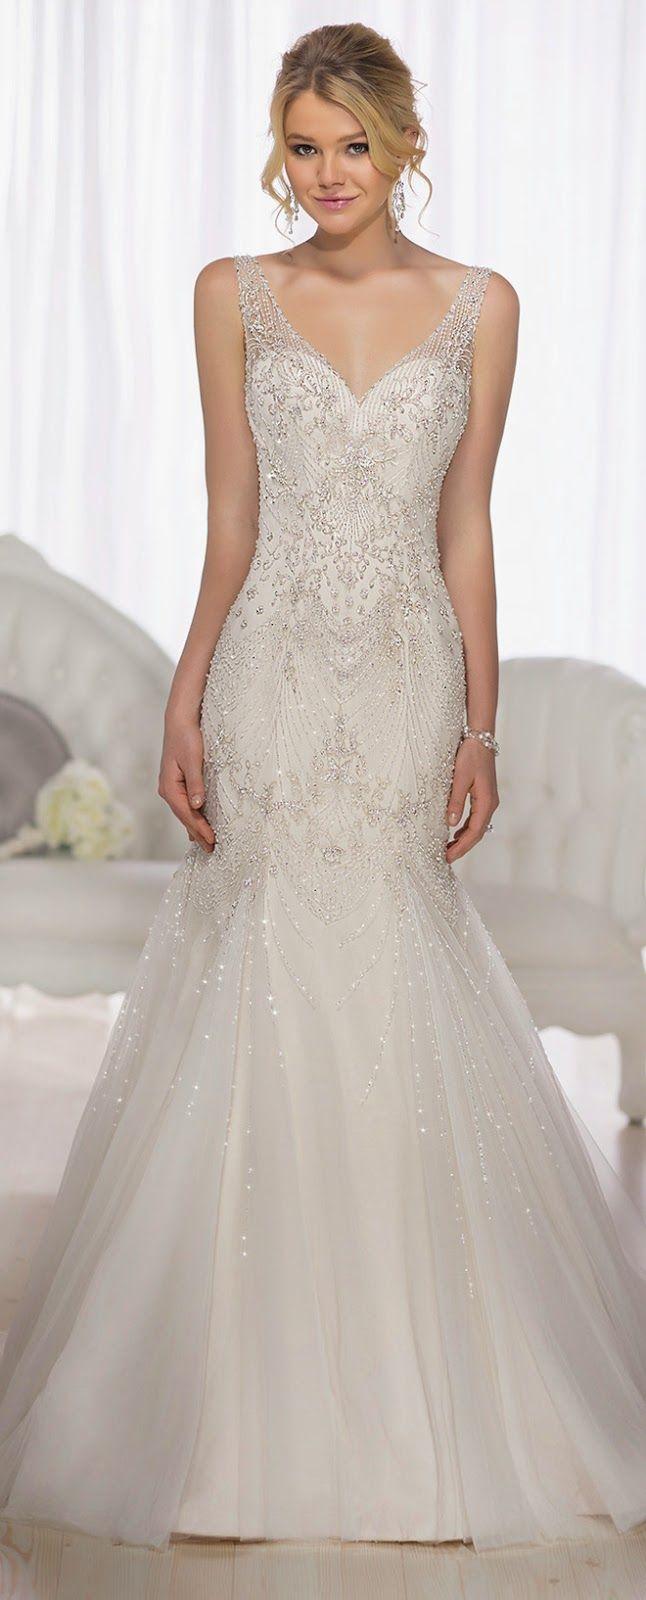 Belles wedding dress  weddingdressessenseofaustraliaspringDaltzoomg